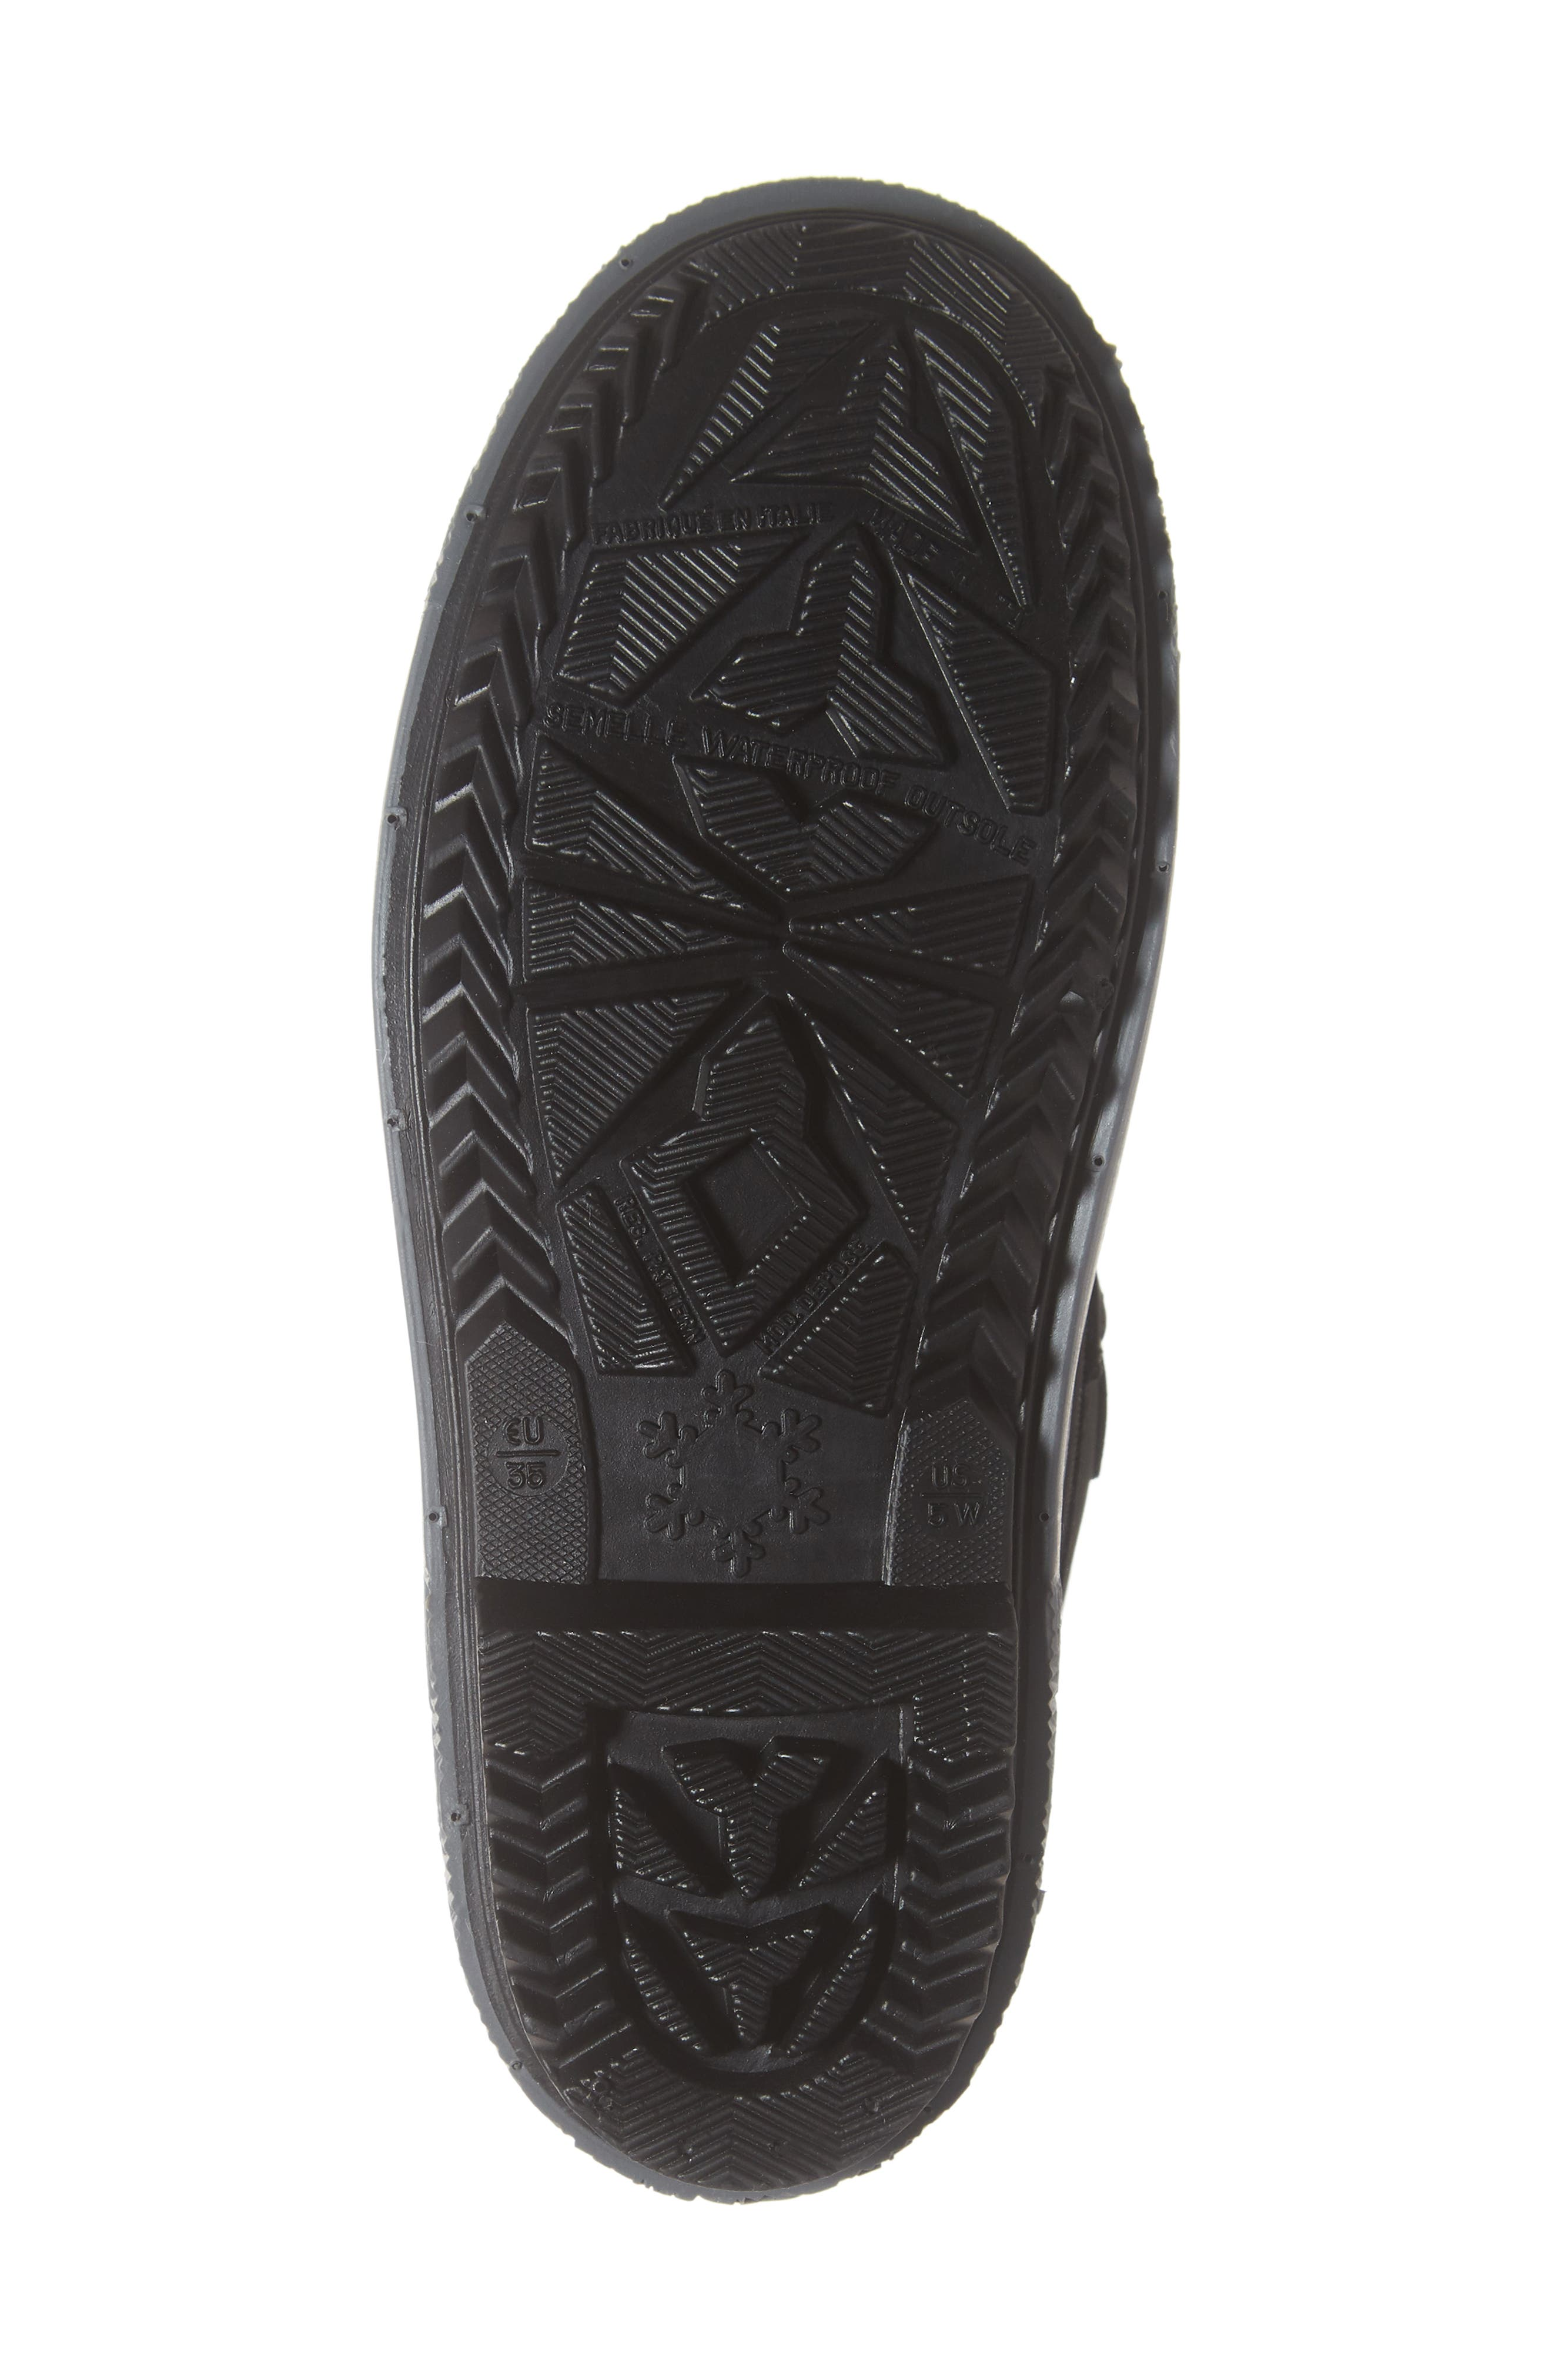 Cali Waterproof Insulated Boot,                             Alternate thumbnail 6, color,                             BROWN/ BLACK